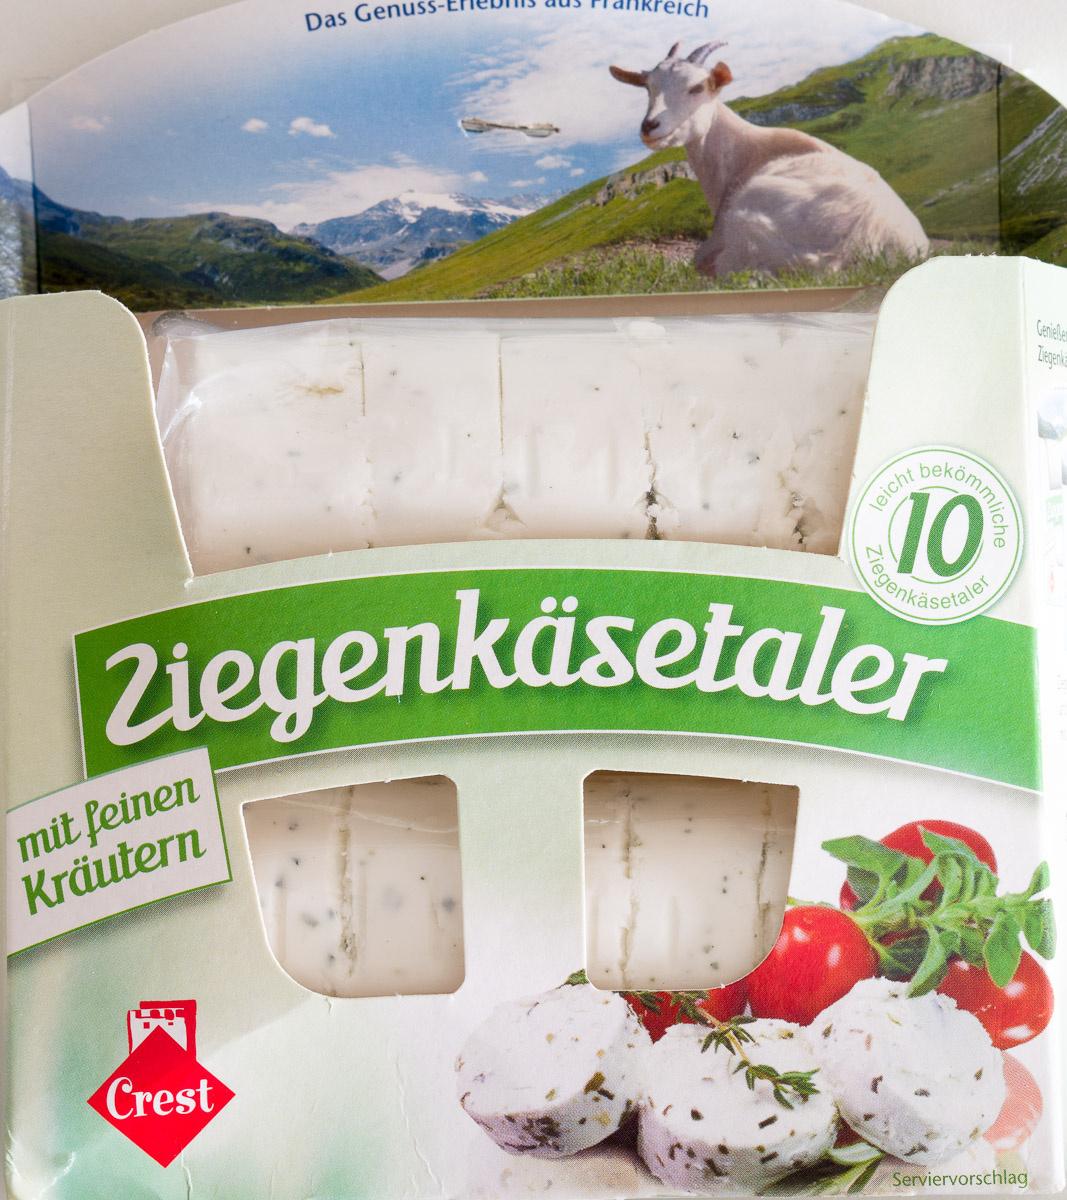 Crest Foods Company Mail: Ziegenkäsetaler Mit Feinen Kräutern